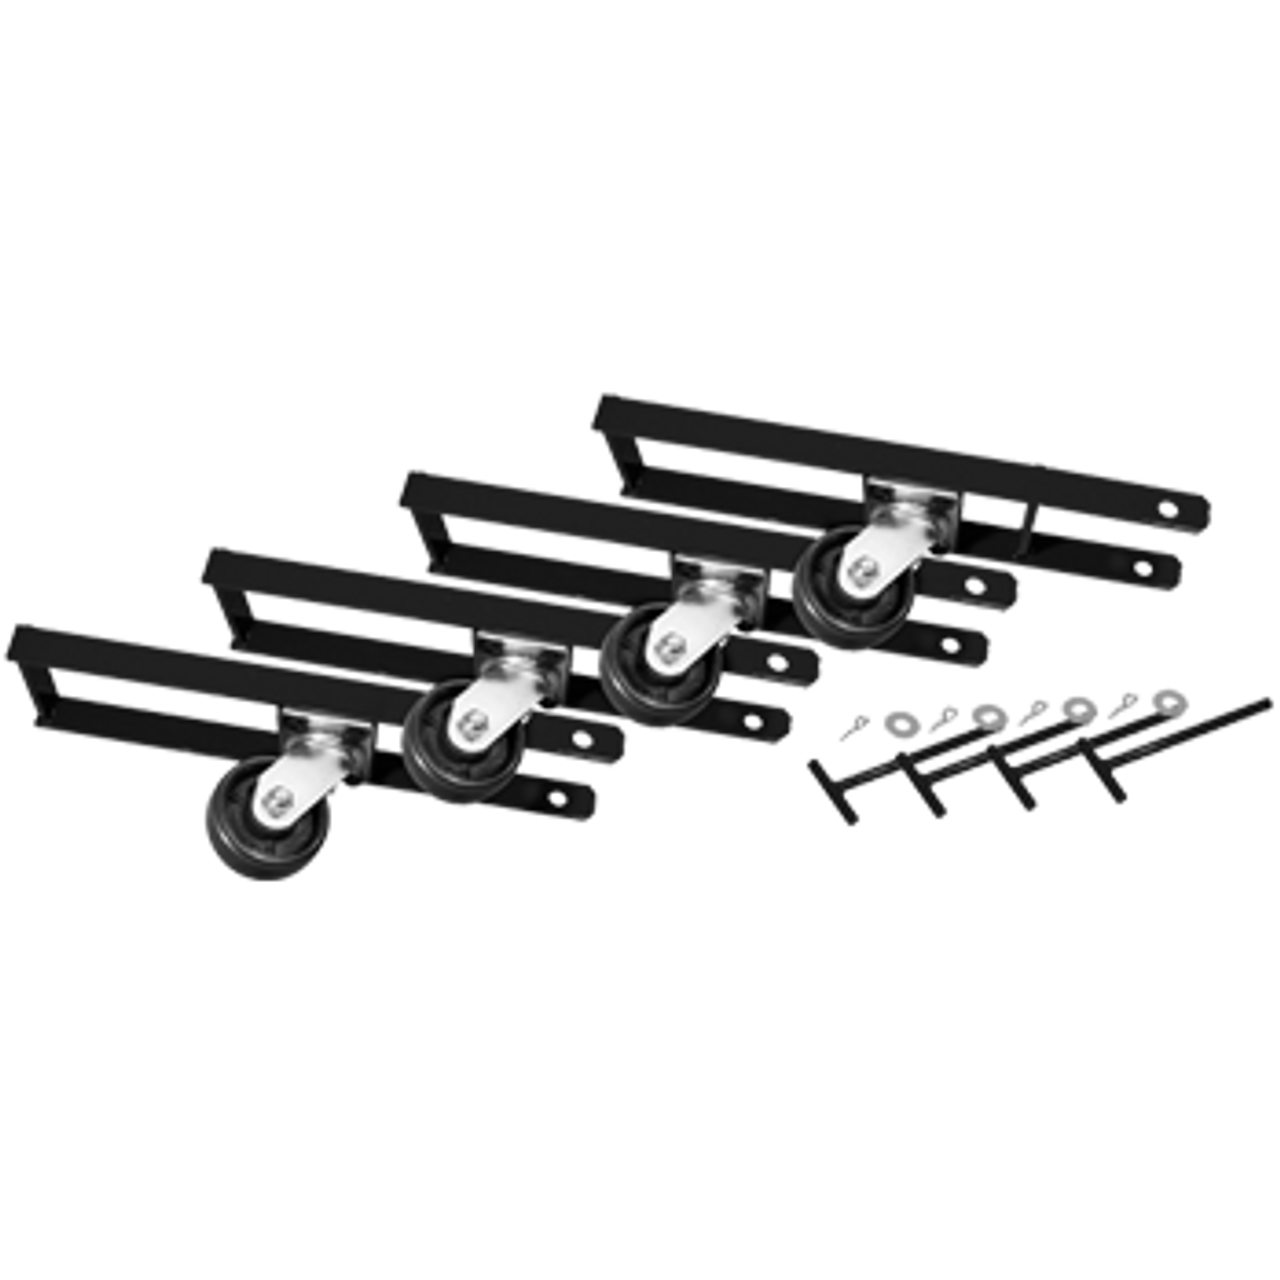 BENDPAK Caster Kit Portable Wheel Kit for HD-9 Series